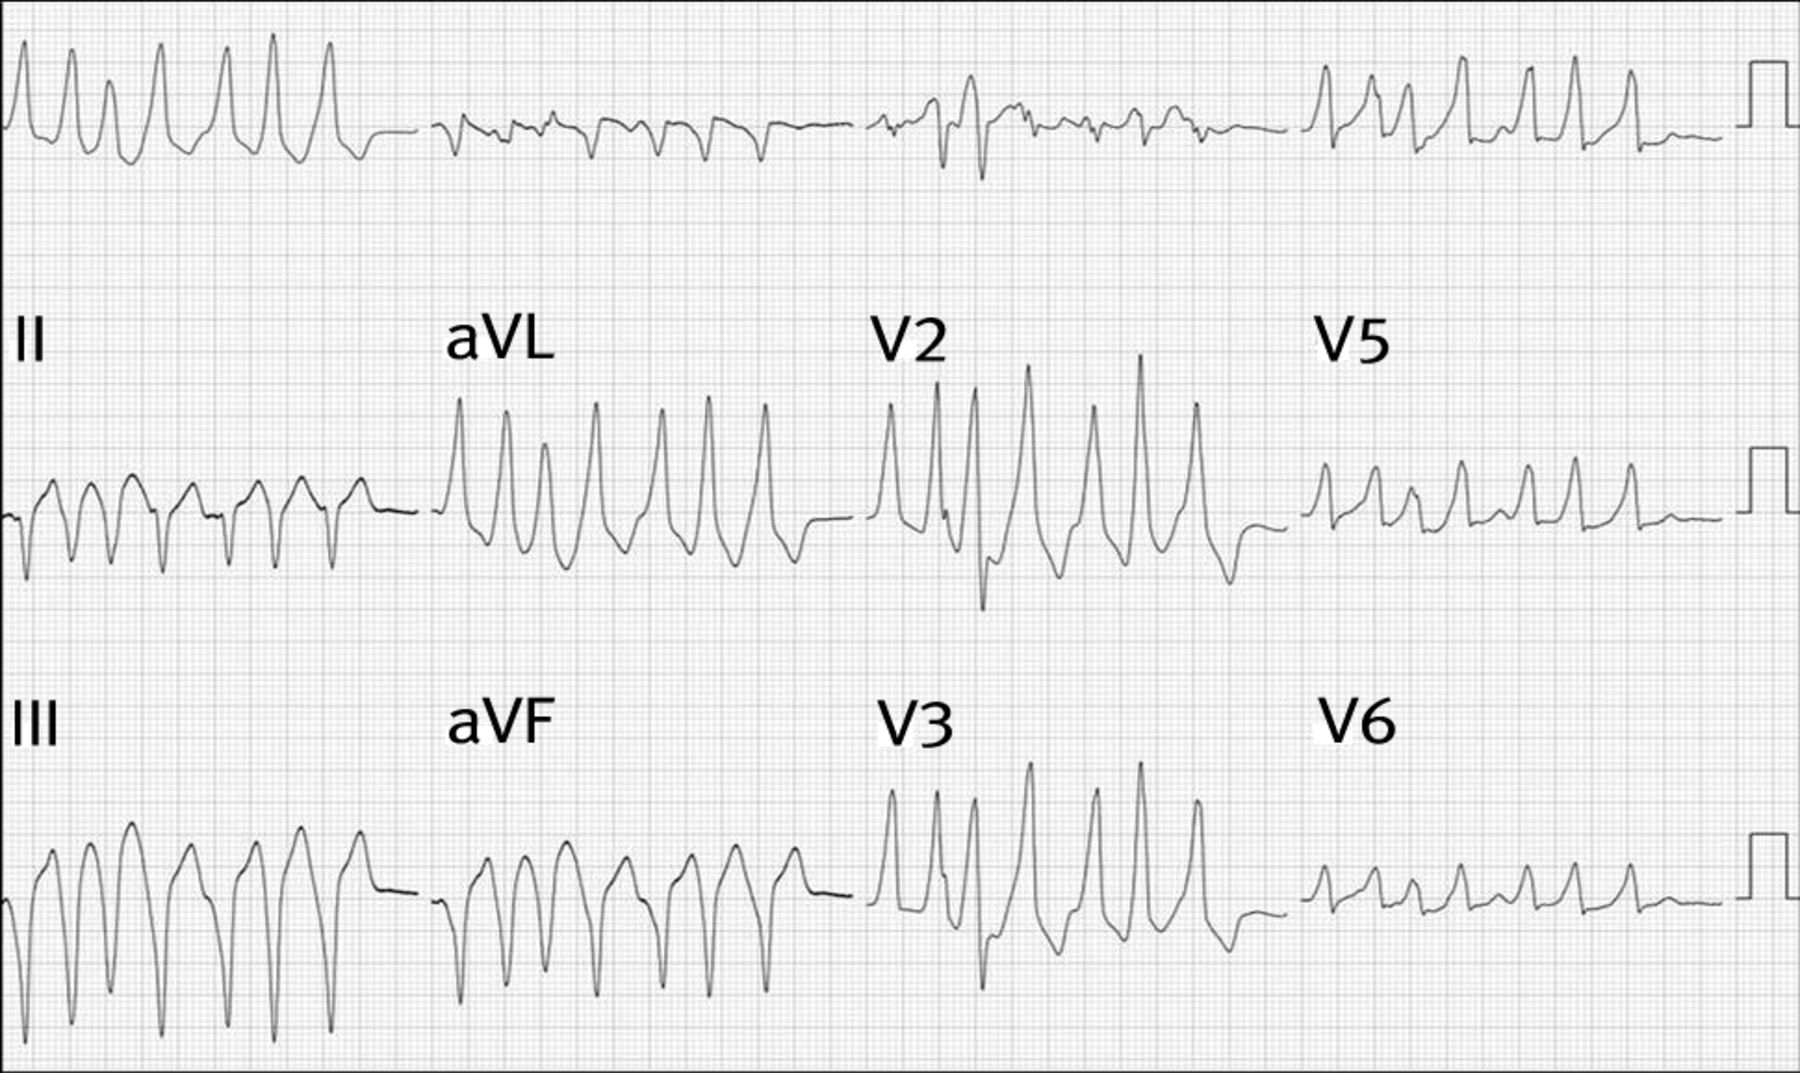 Diagnosis And Management Of Supraventricular Tachycardia